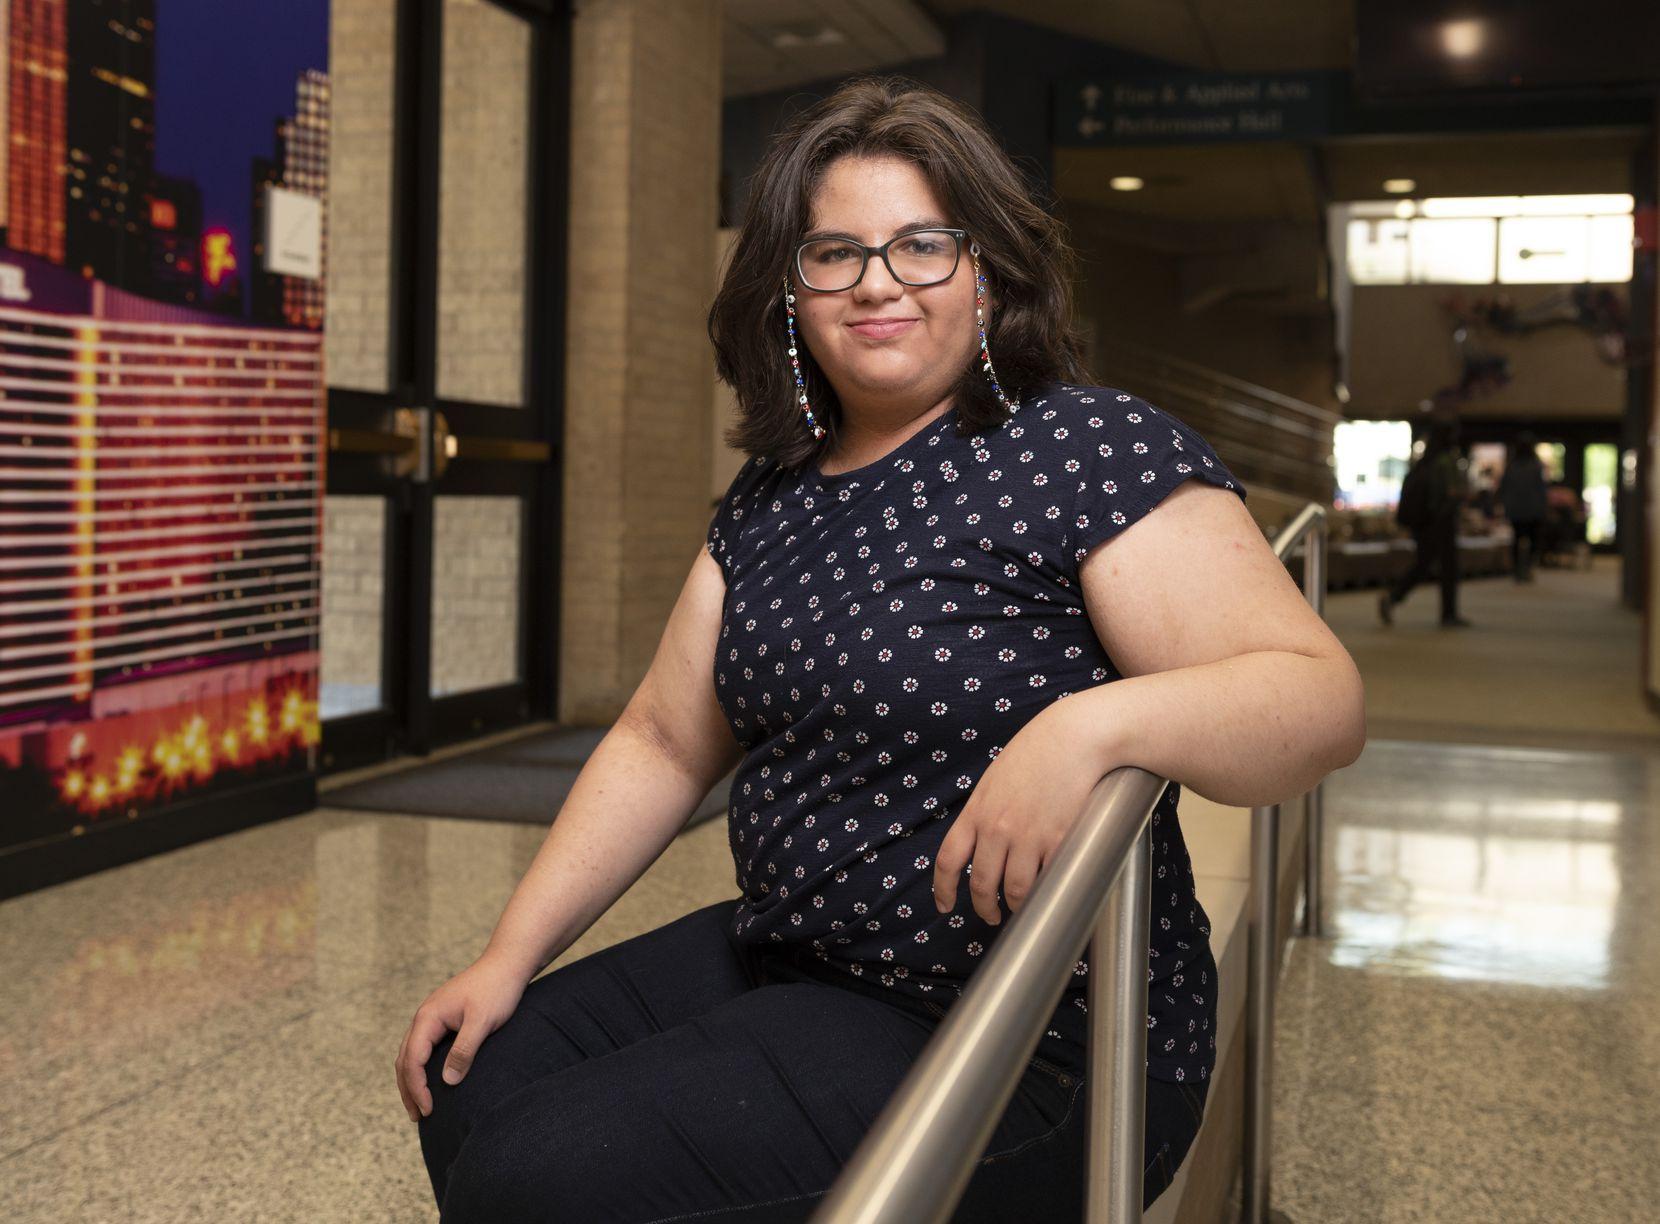 Barbara Gandica-Martinez, 20, graduated this spring and plans to study animation at UT-Dallas.